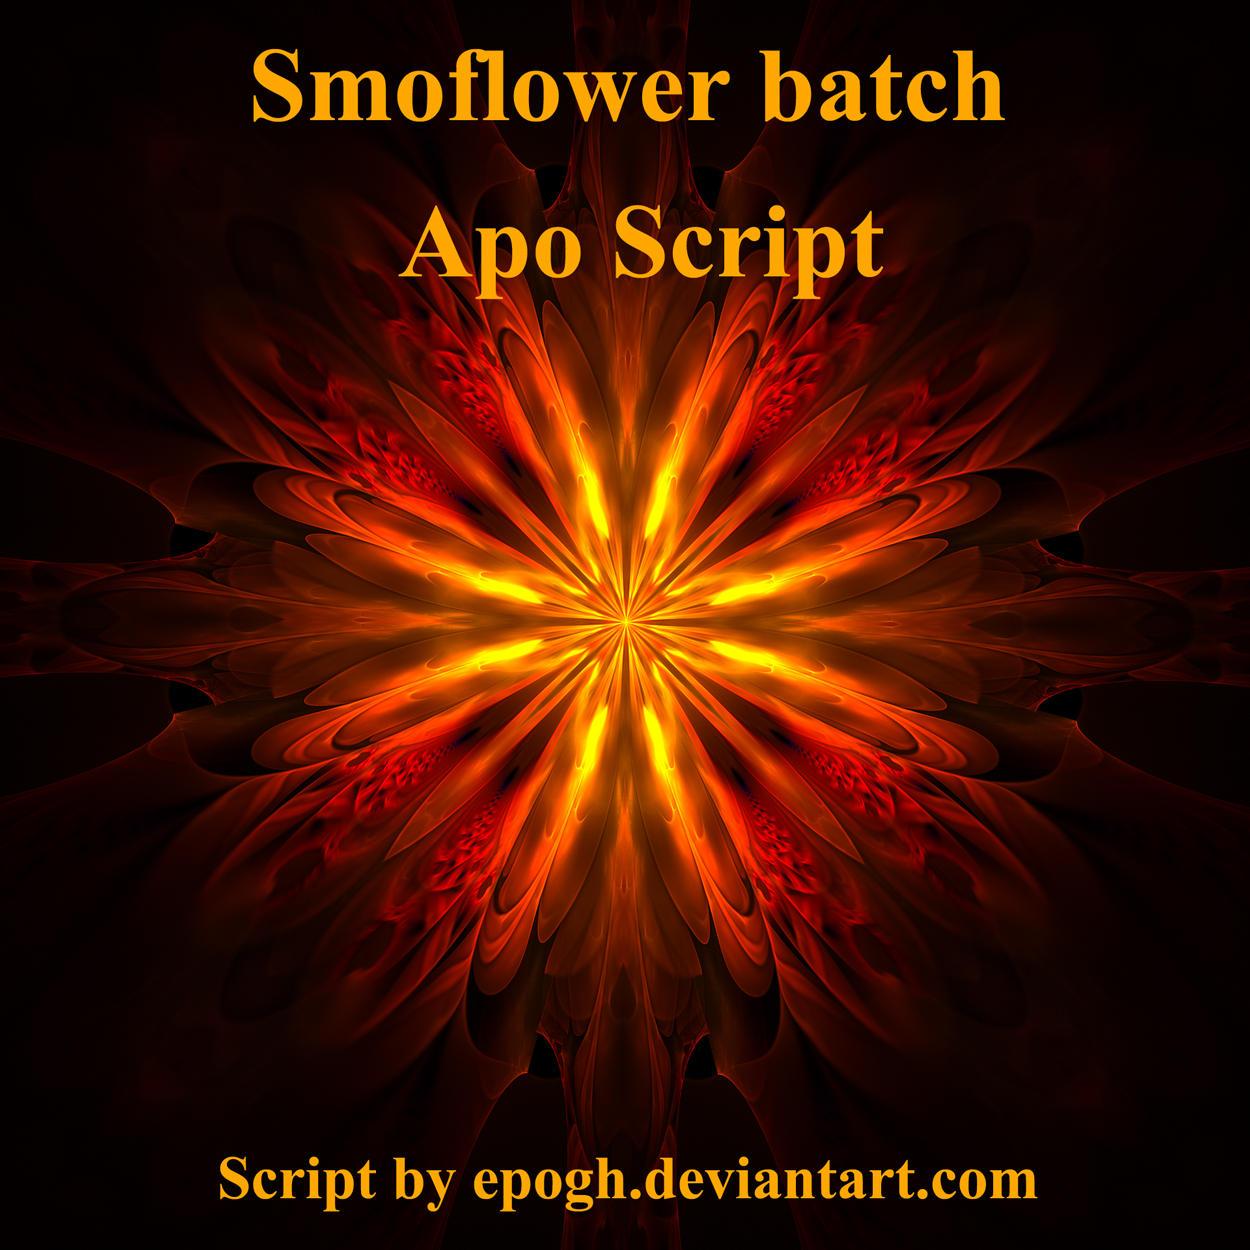 Smoflower Apo script by Epogh